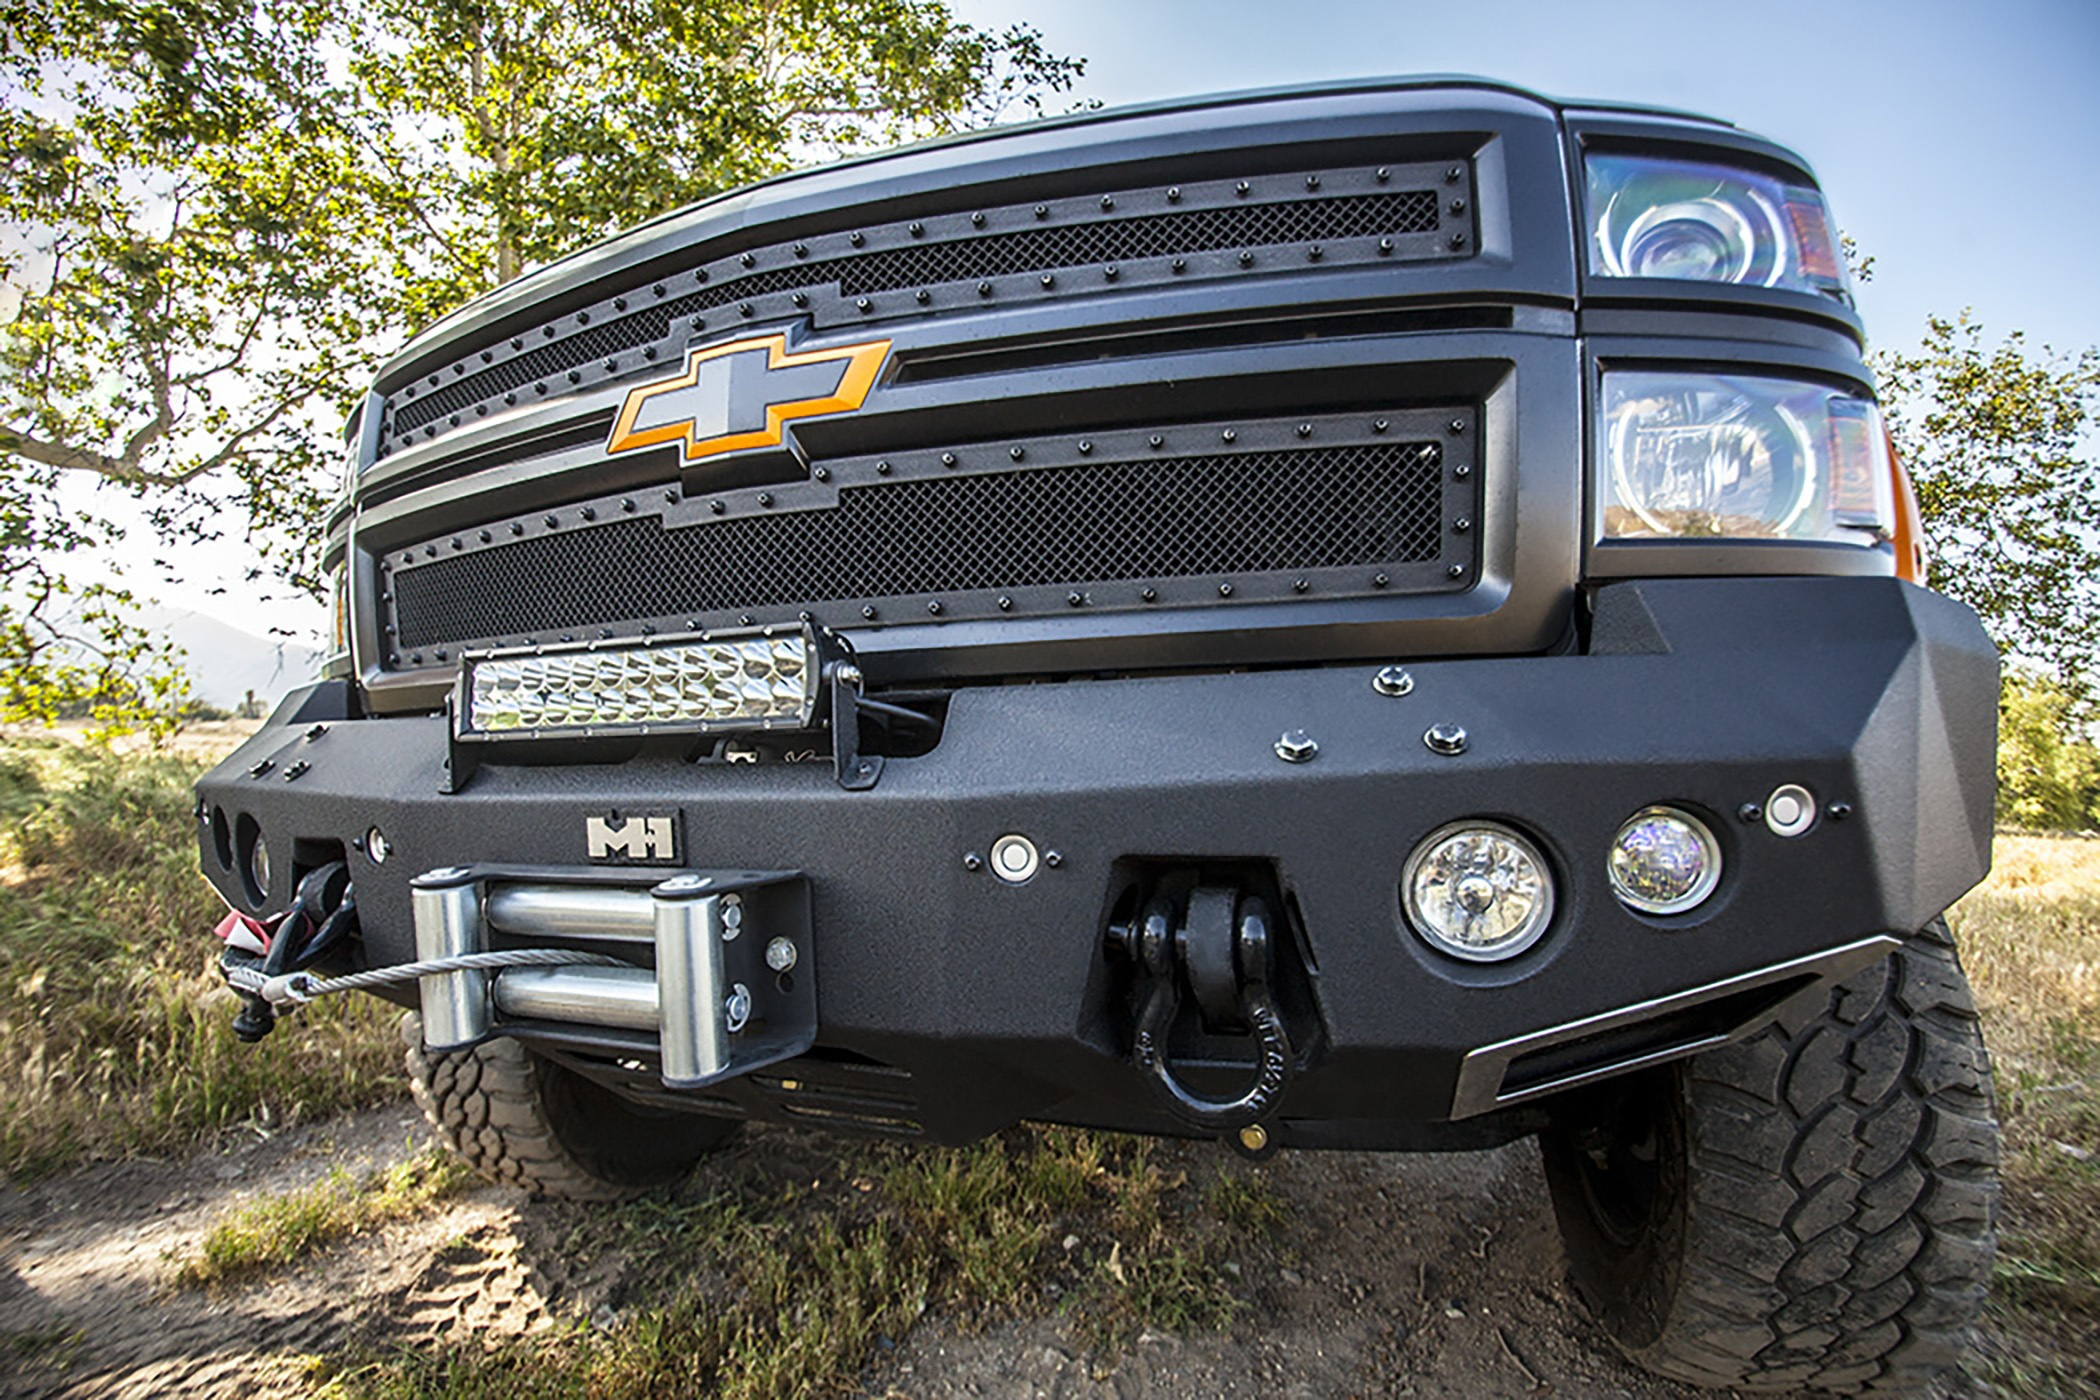 Silverado M 1 Winch Bumpers Medium Duty Work Truck Info